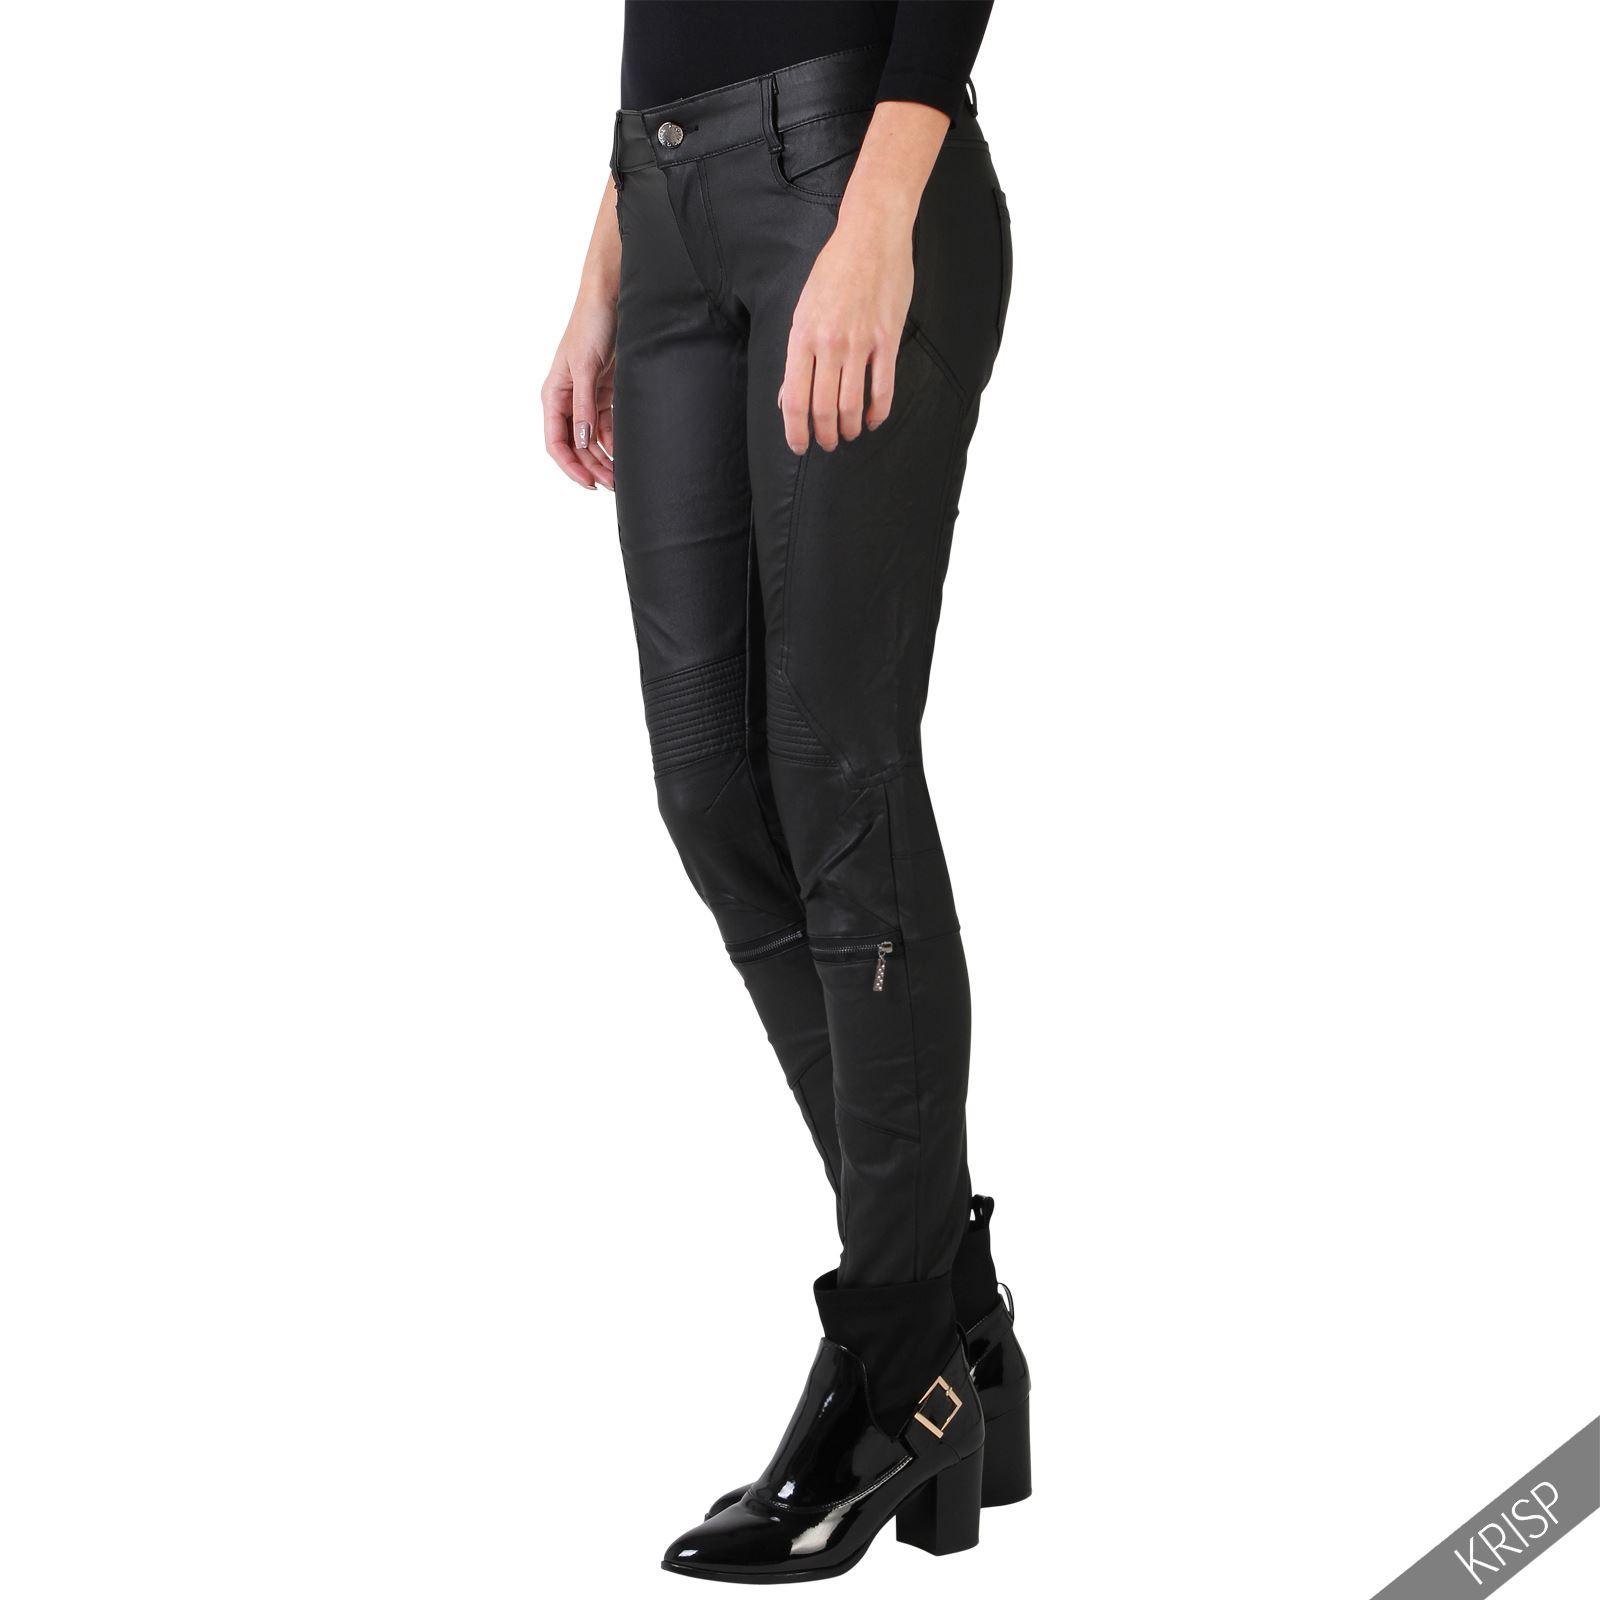 New KAUFMANFRANCO Womens Leather Skinny Pants  Allfabclothing